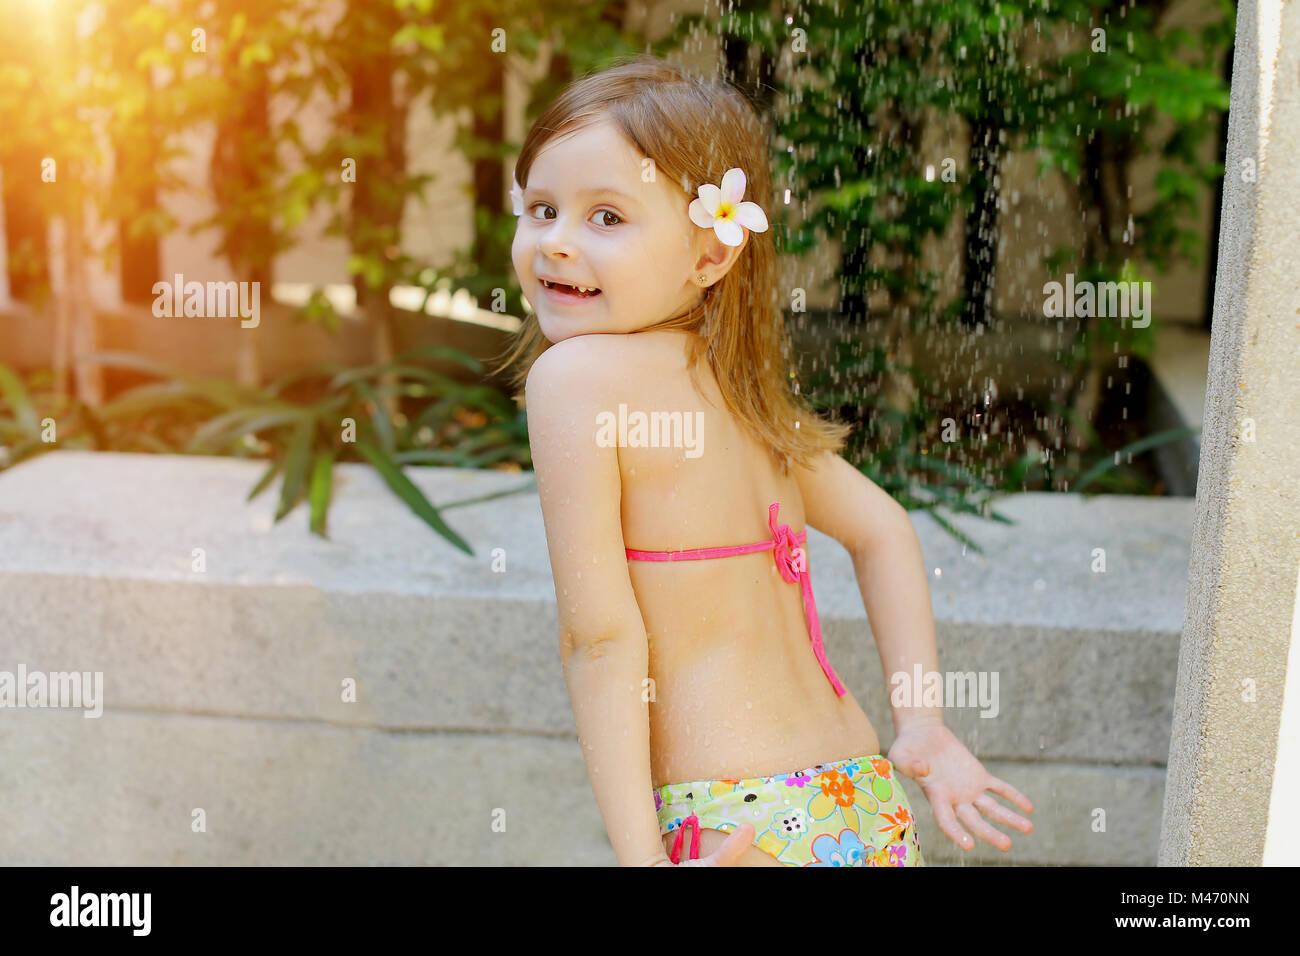 Kid Taking Shower Drops Of Water Fall On Little Girl In